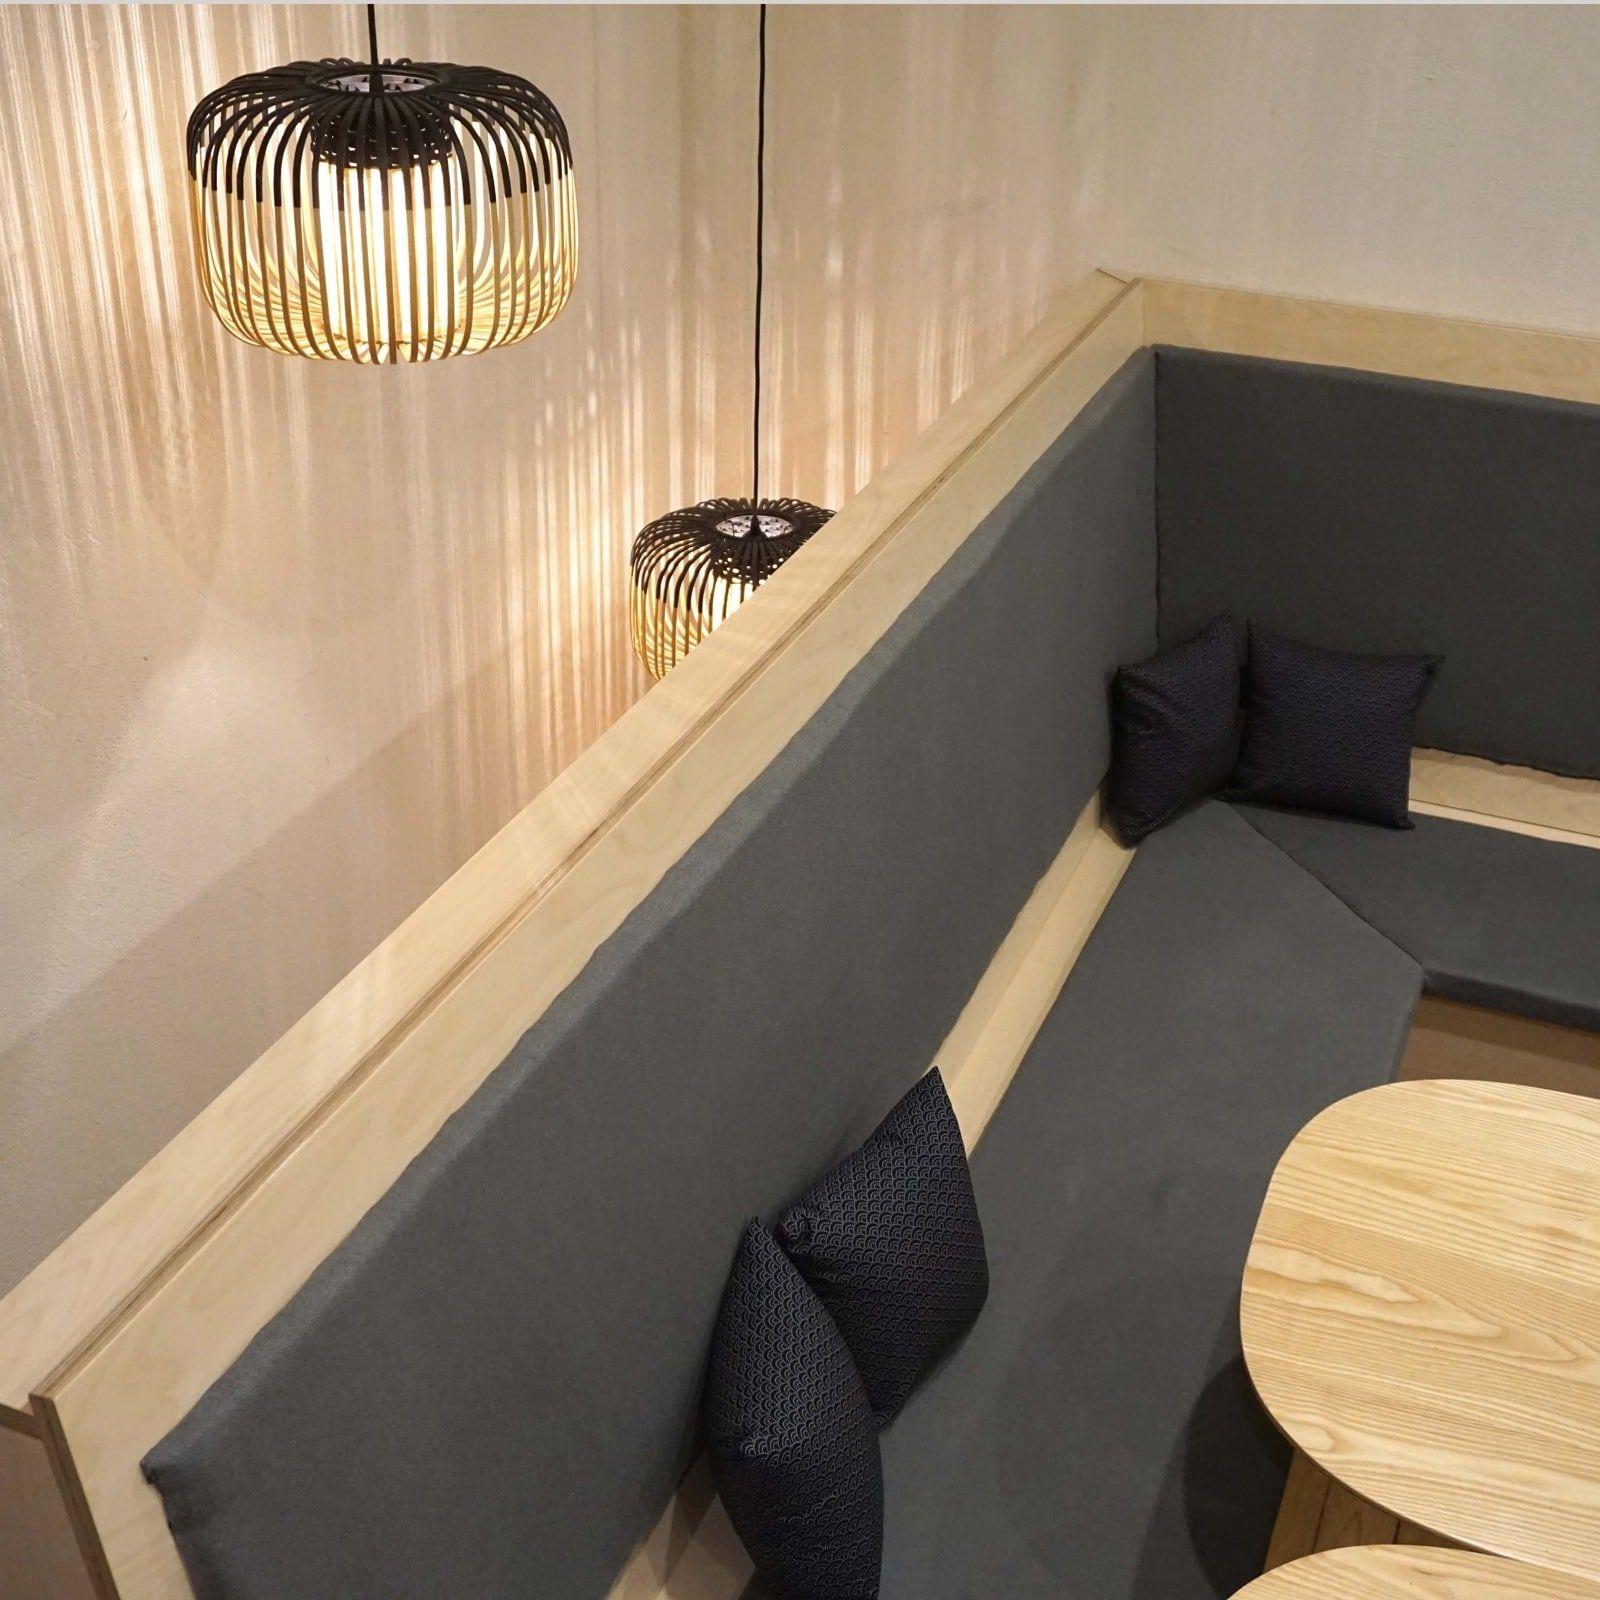 Banquette angle – Amenagement tapisserie Hana Bento – Etage rue de Paradis – 1